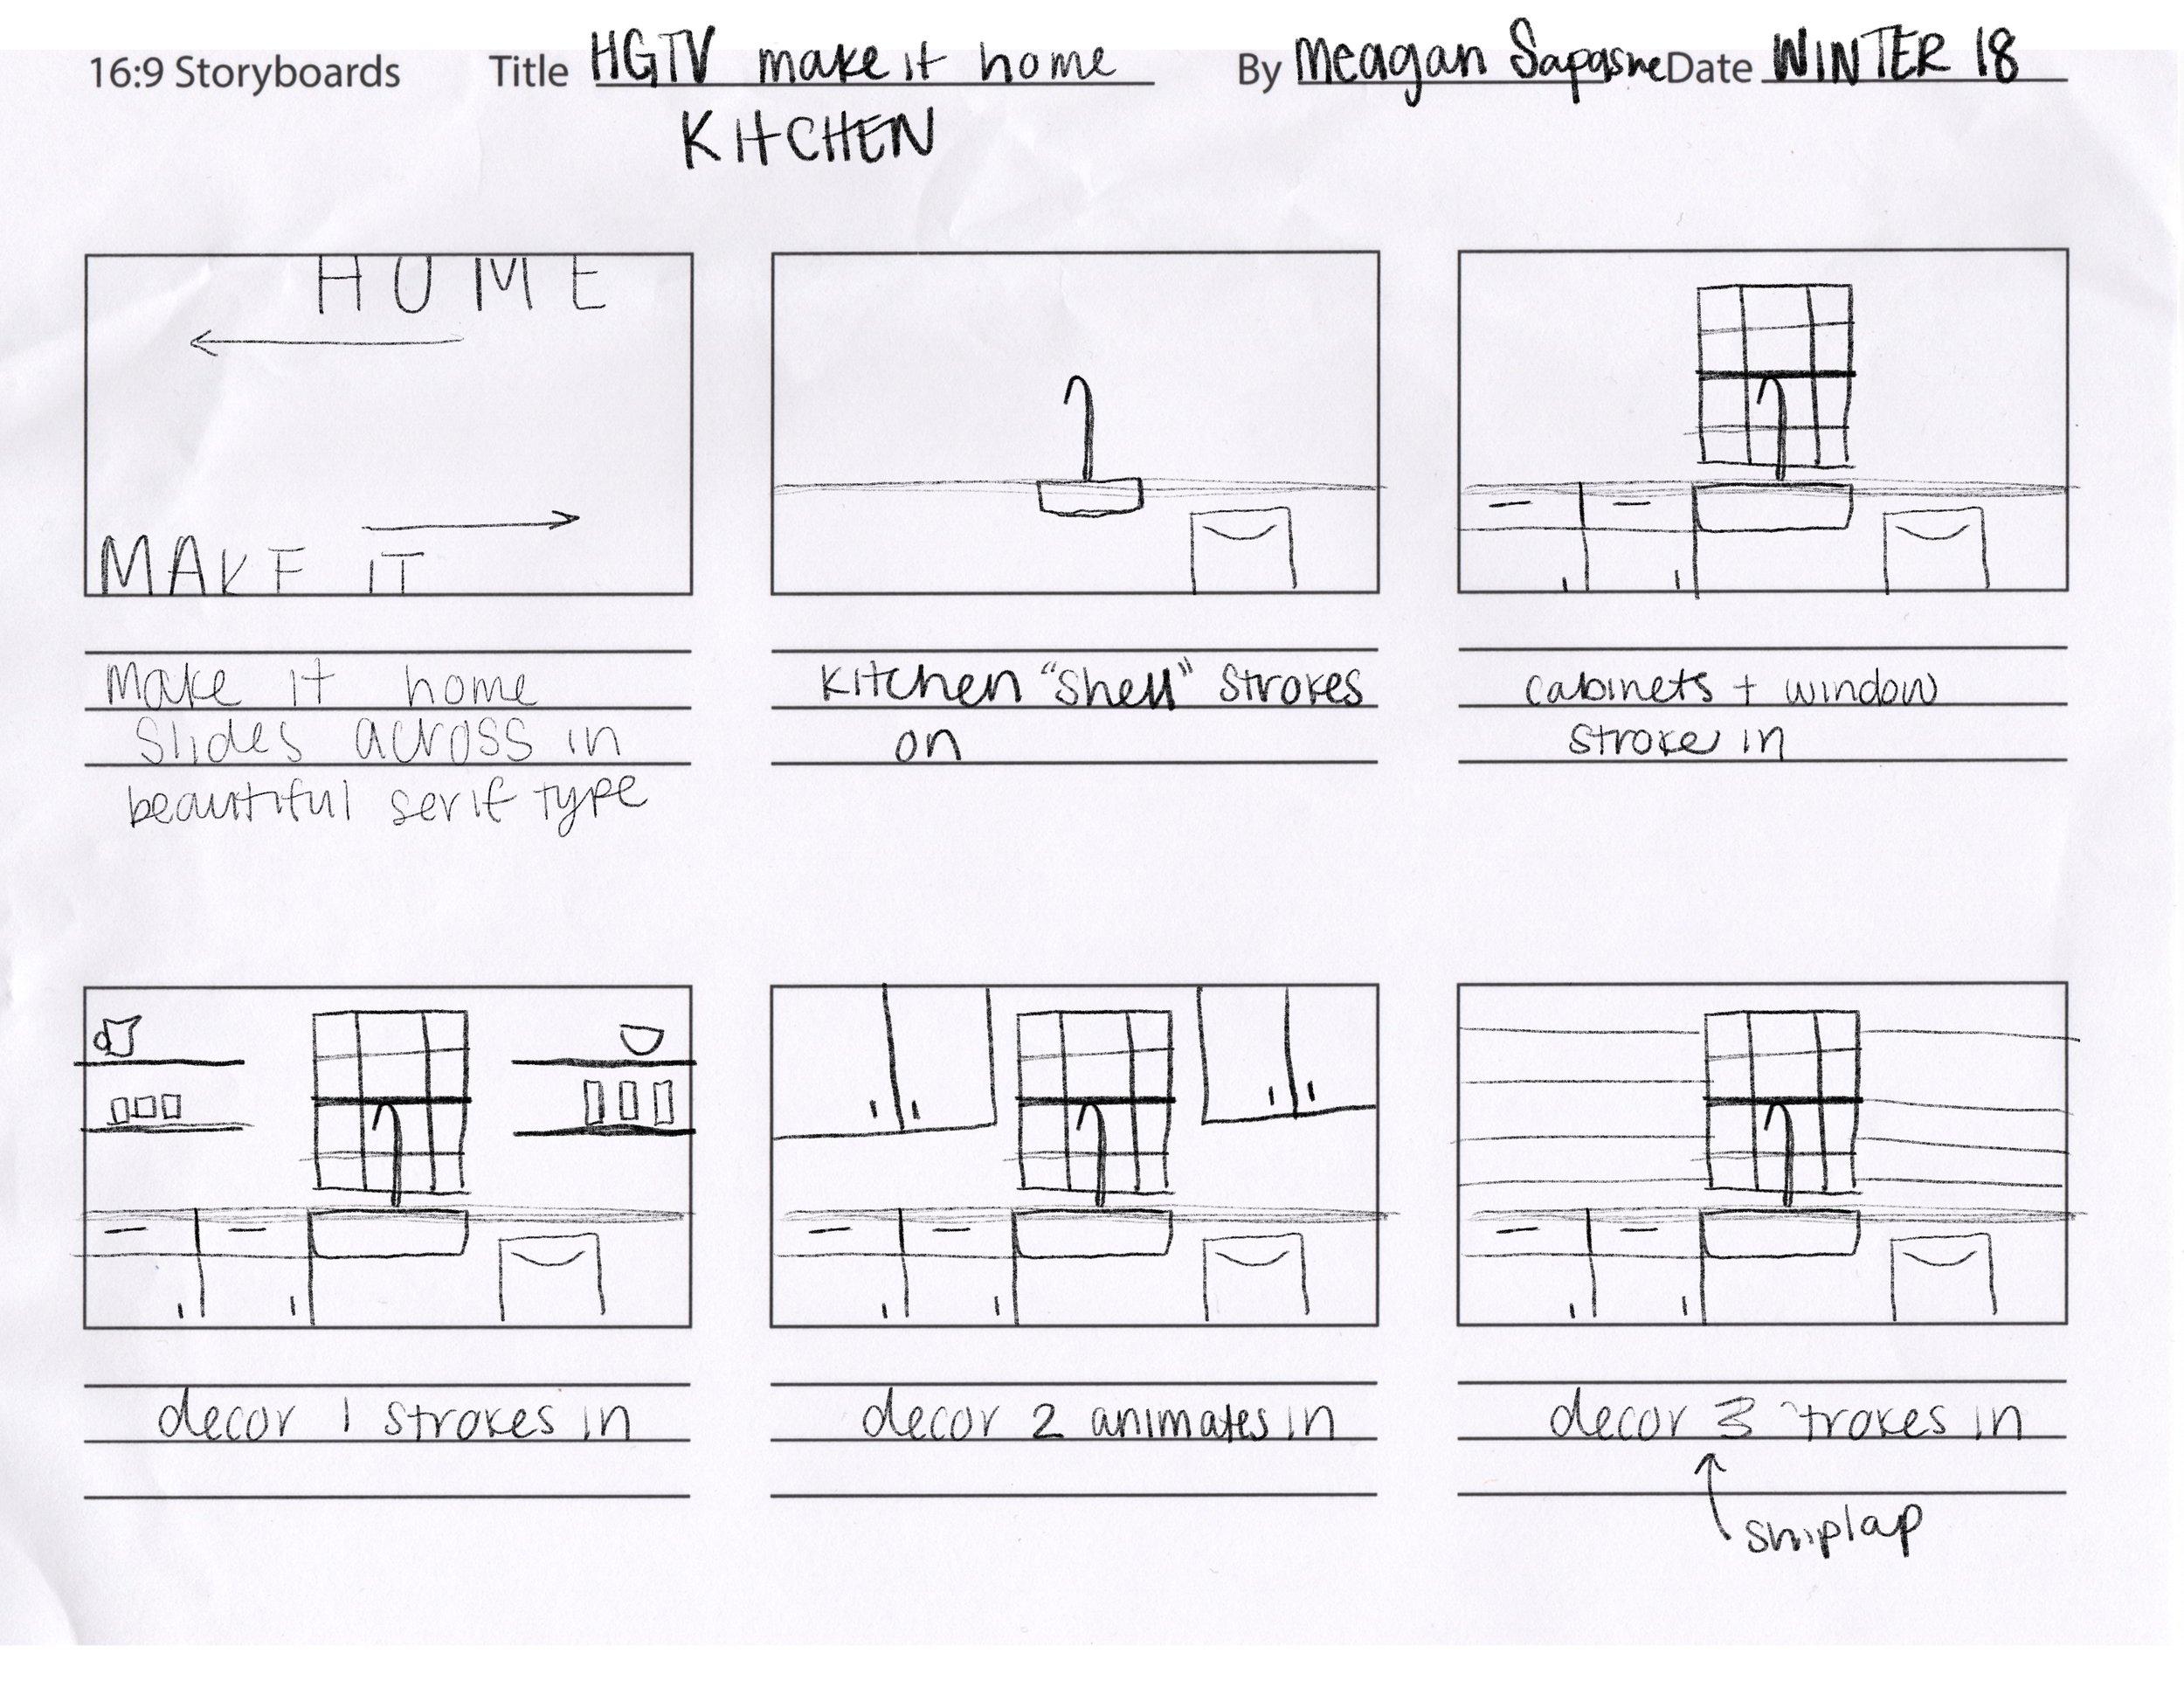 Kitchen_Storyboard_1.JPG